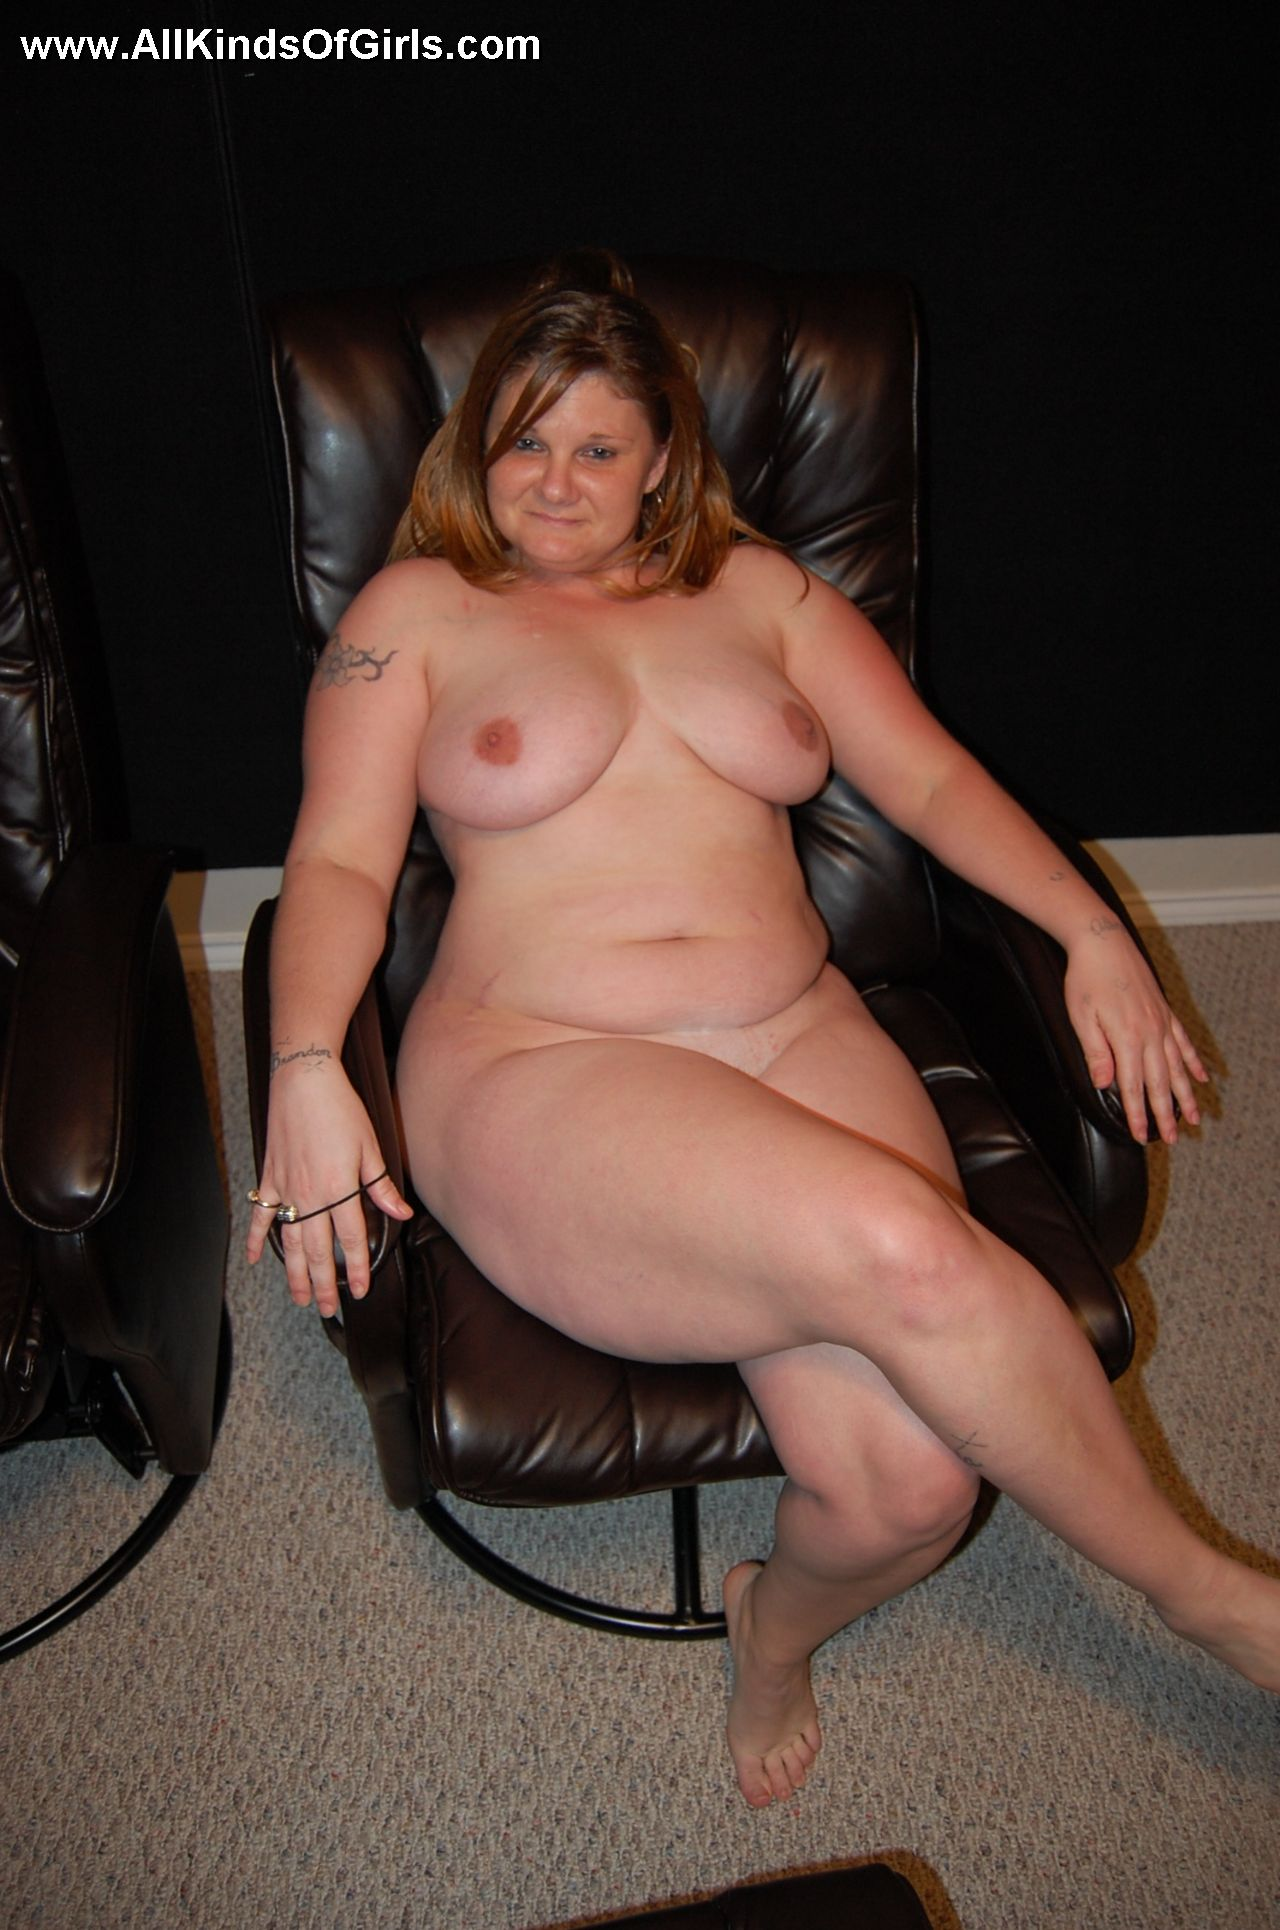 Chubby sexy dallas nude girl authoritative